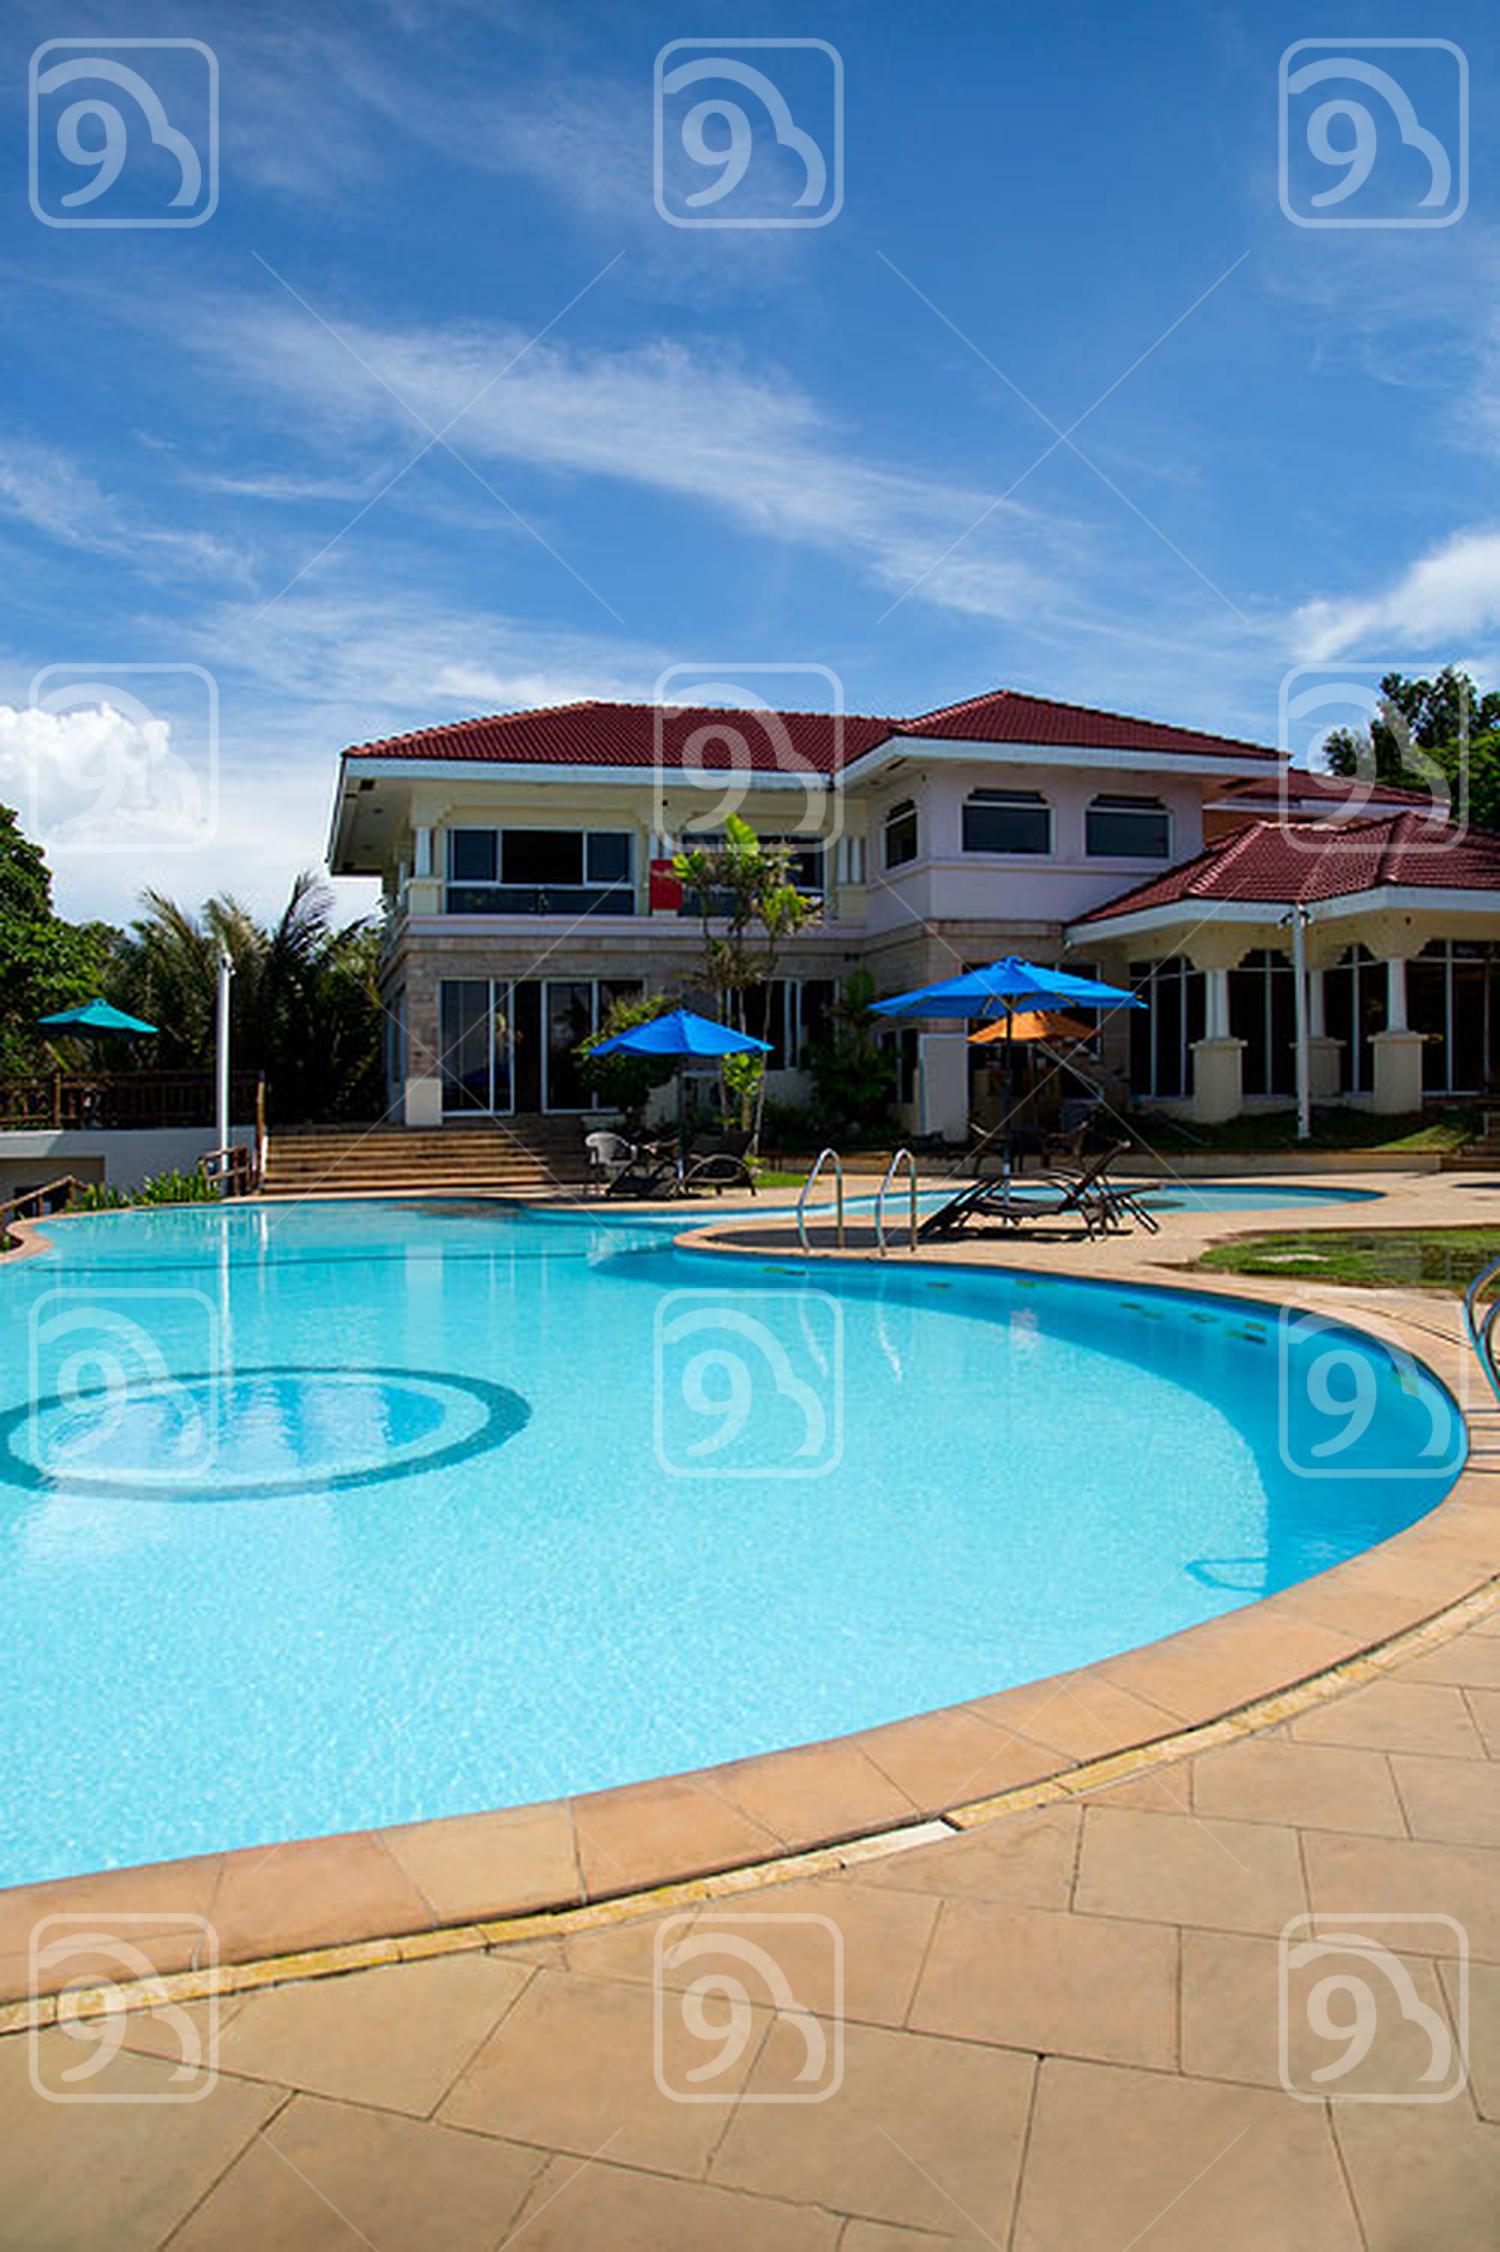 Hotel in long beach island